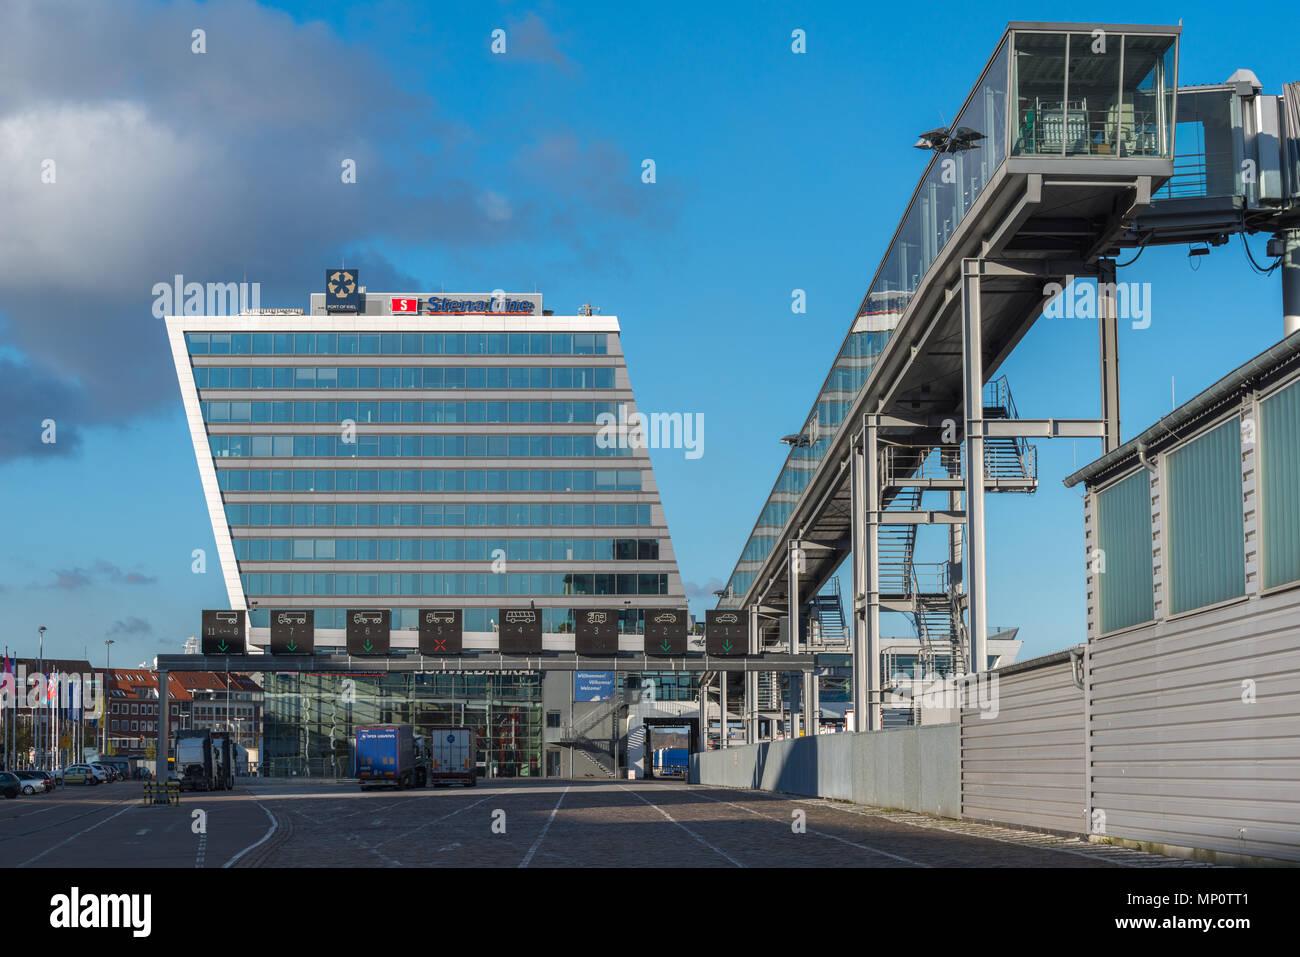 Lorries waiting at the check-in for the ferryboat to Sweden, Kiel, Schweden Kai or Sweden Pier, Kieler Hafen, Kiel Port, Schleswig-Holstein, Germany Stock Photo